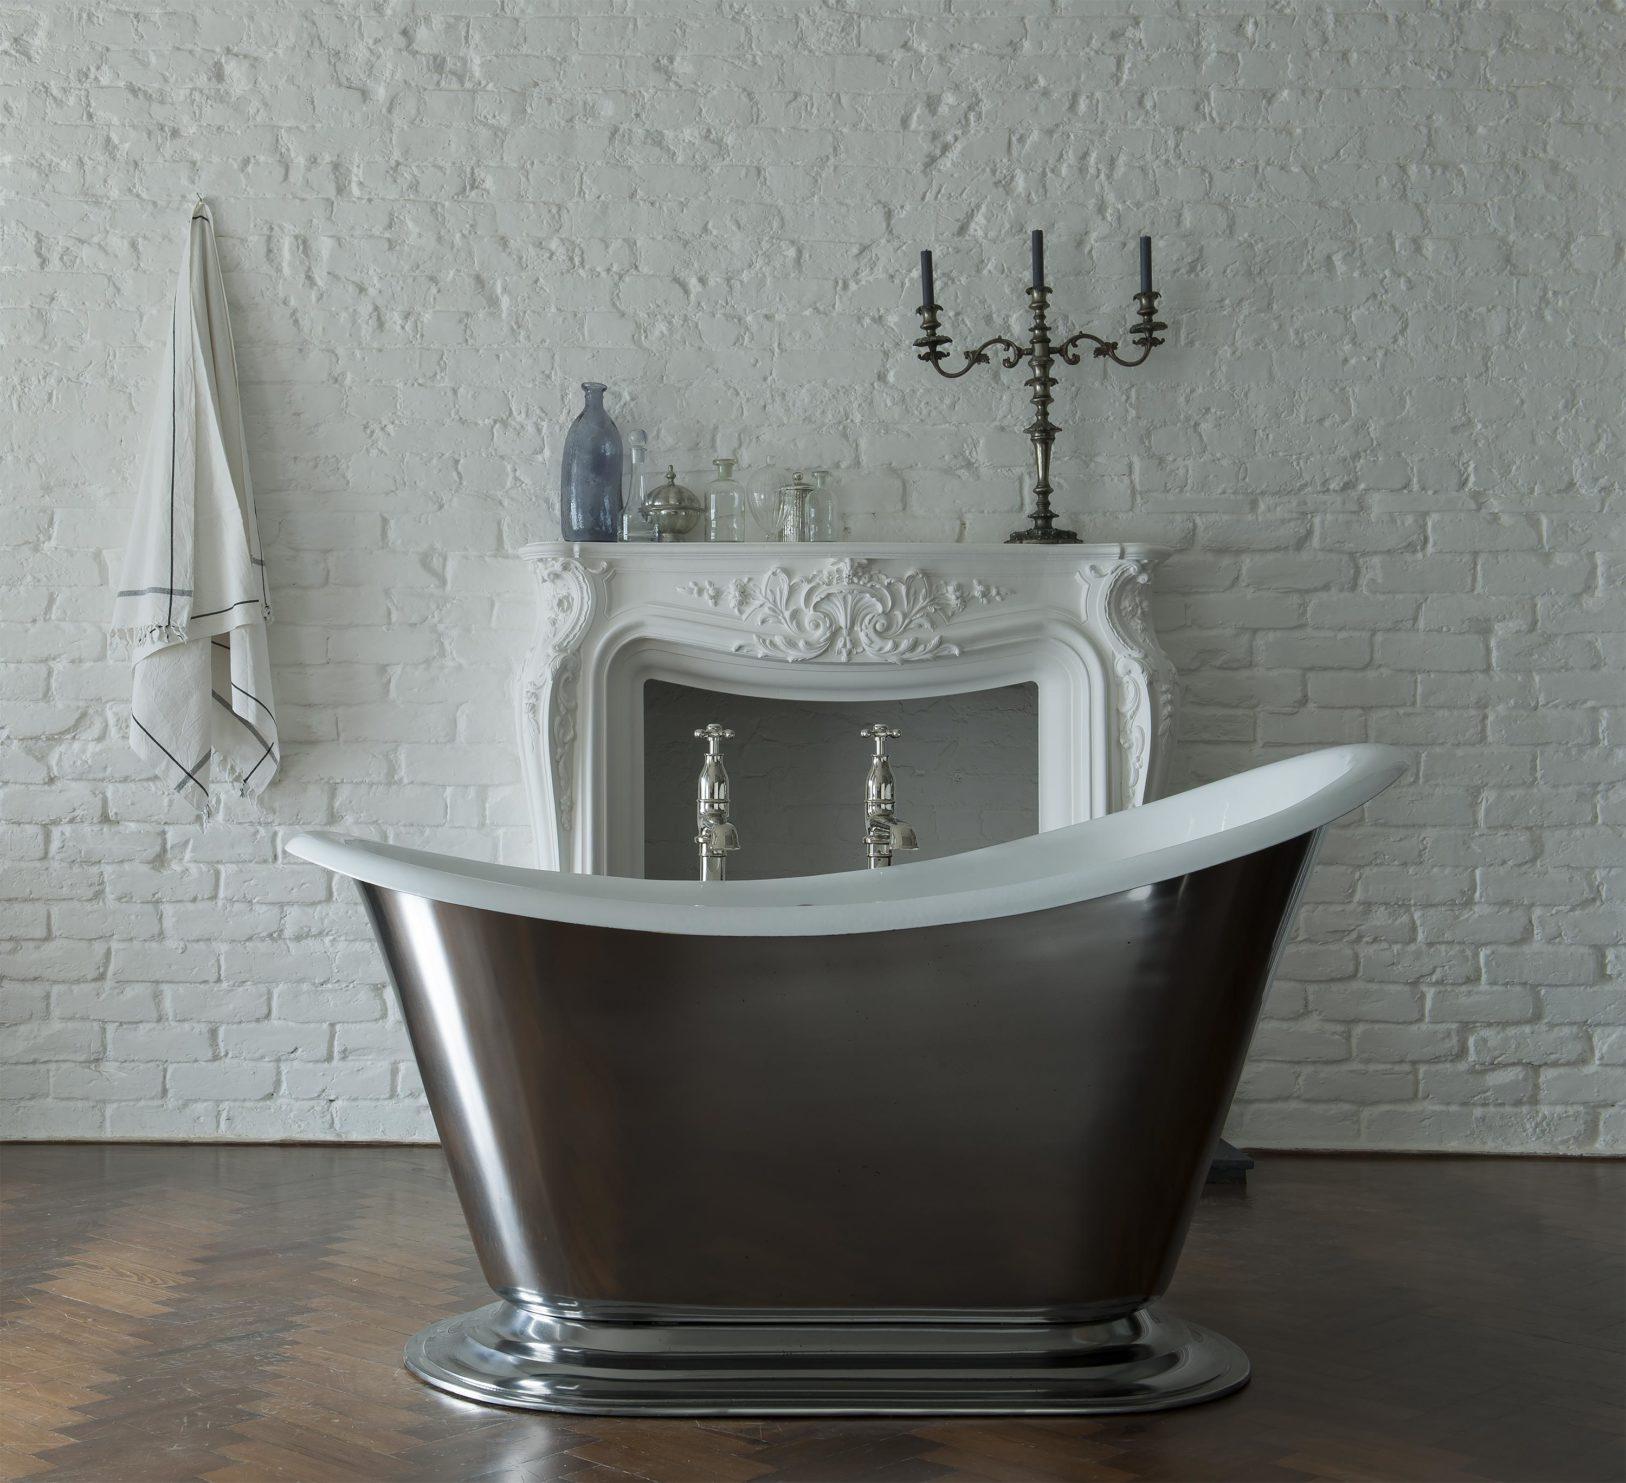 The Morar cast iron slipper bath tub